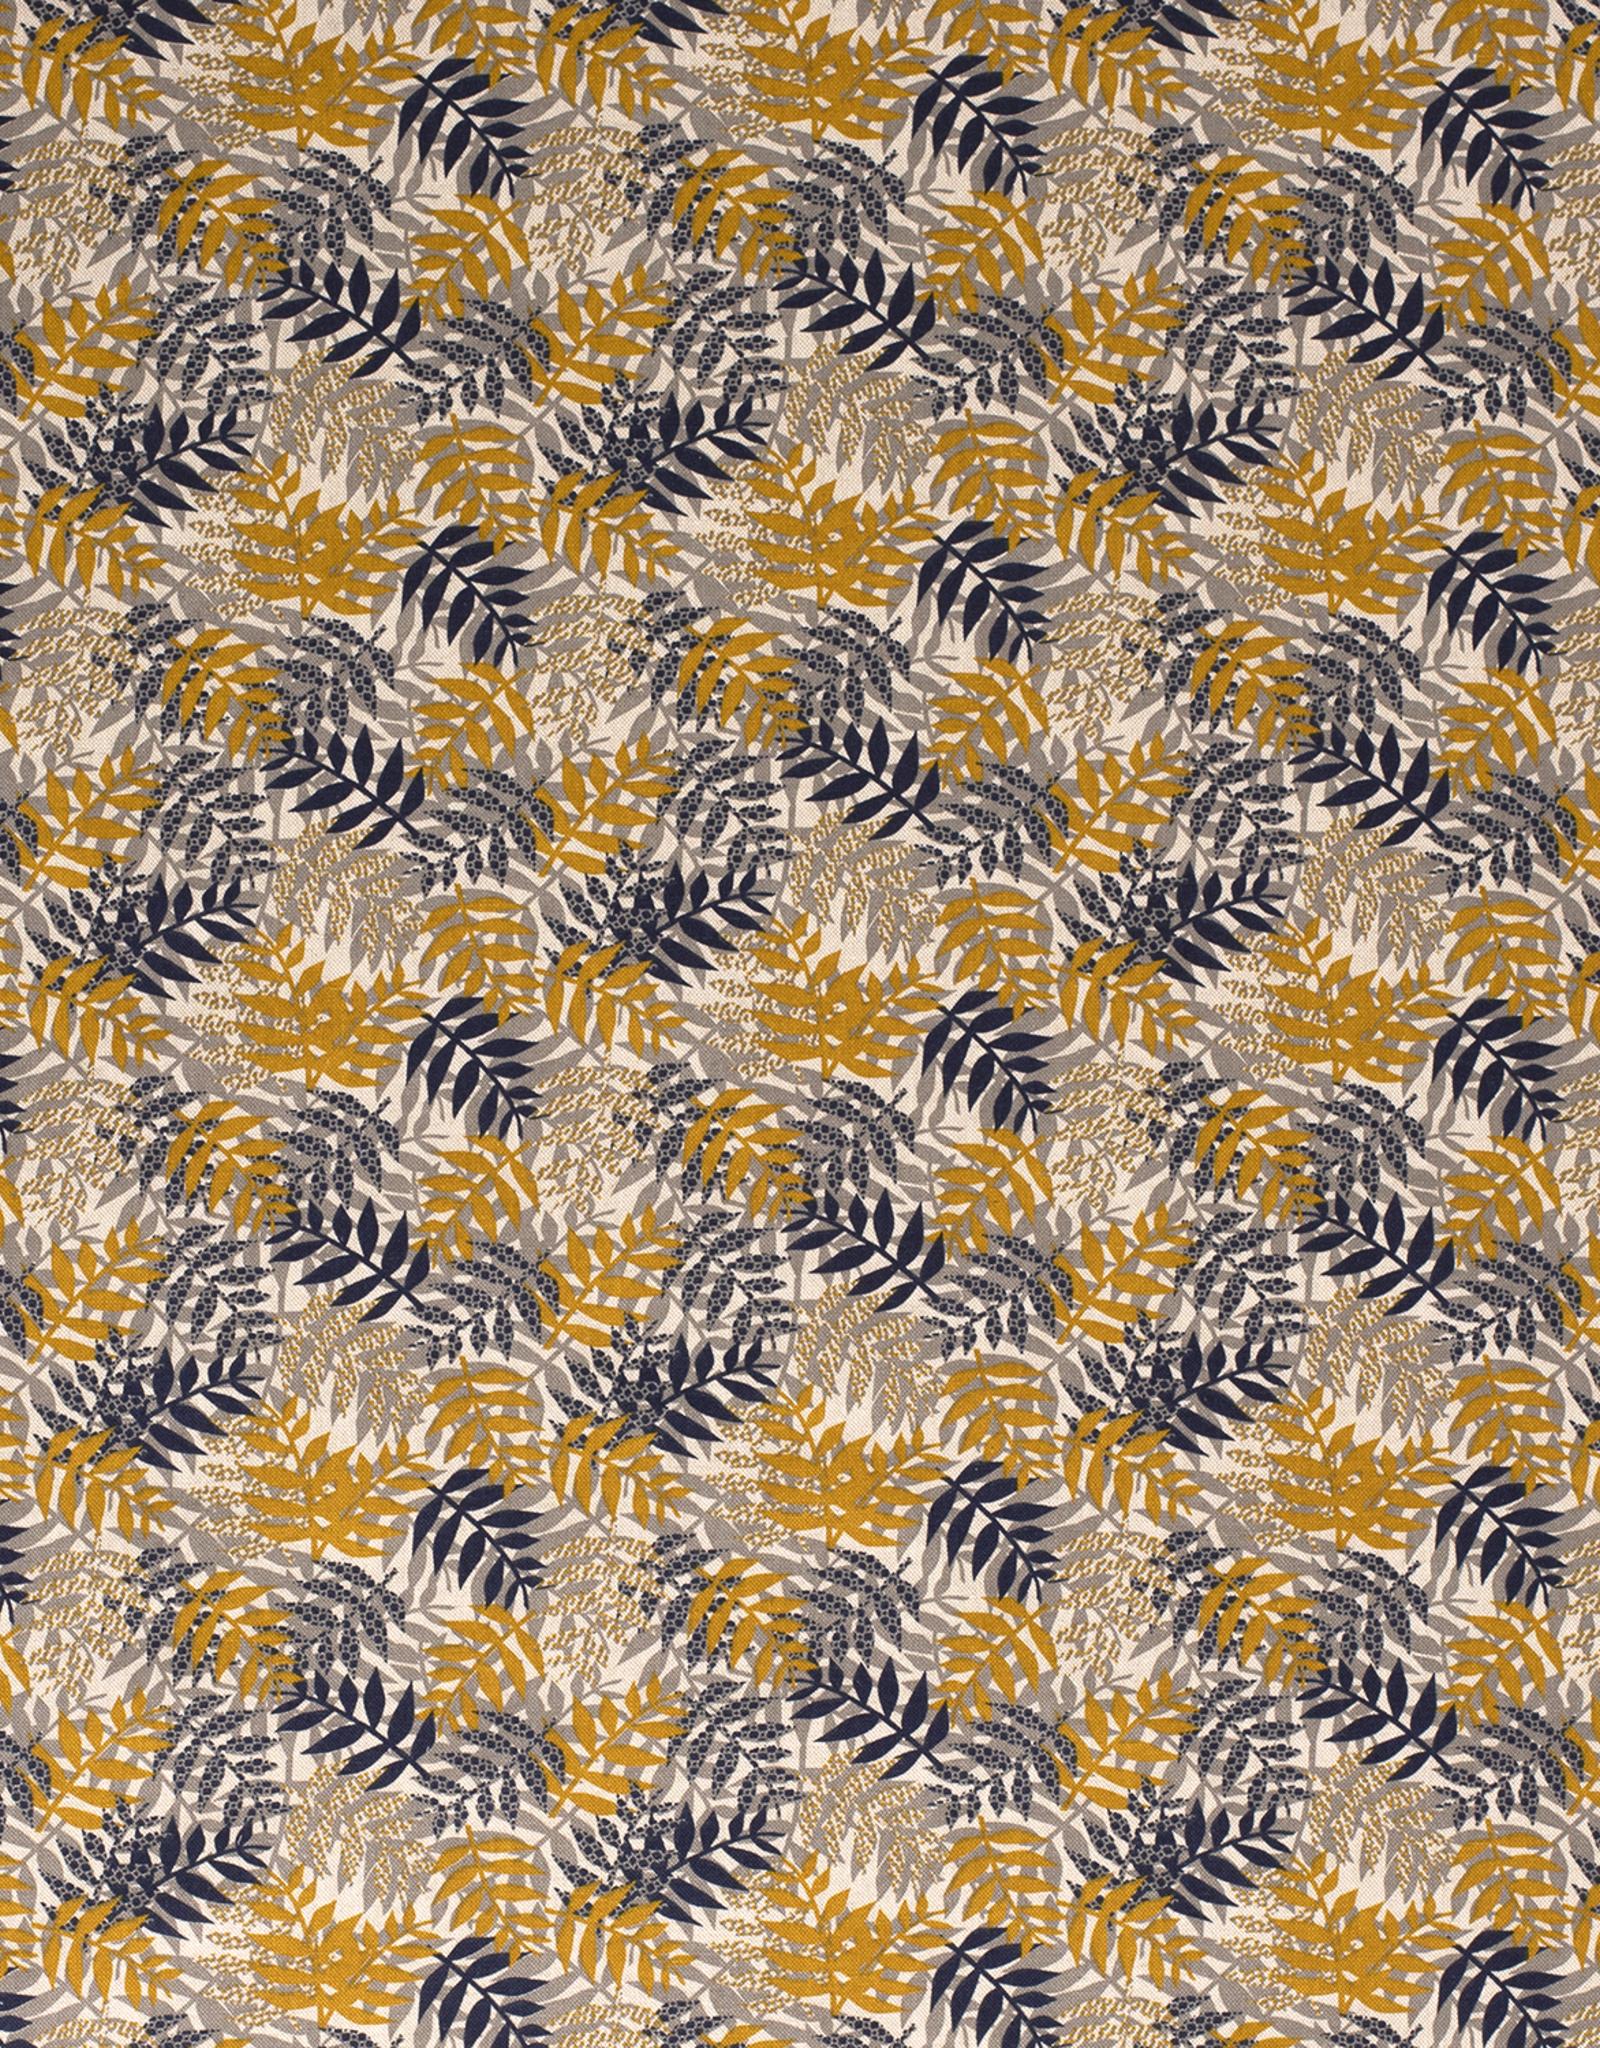 Nooteboom Deco canvas linnenlook oker/grey/navy plants